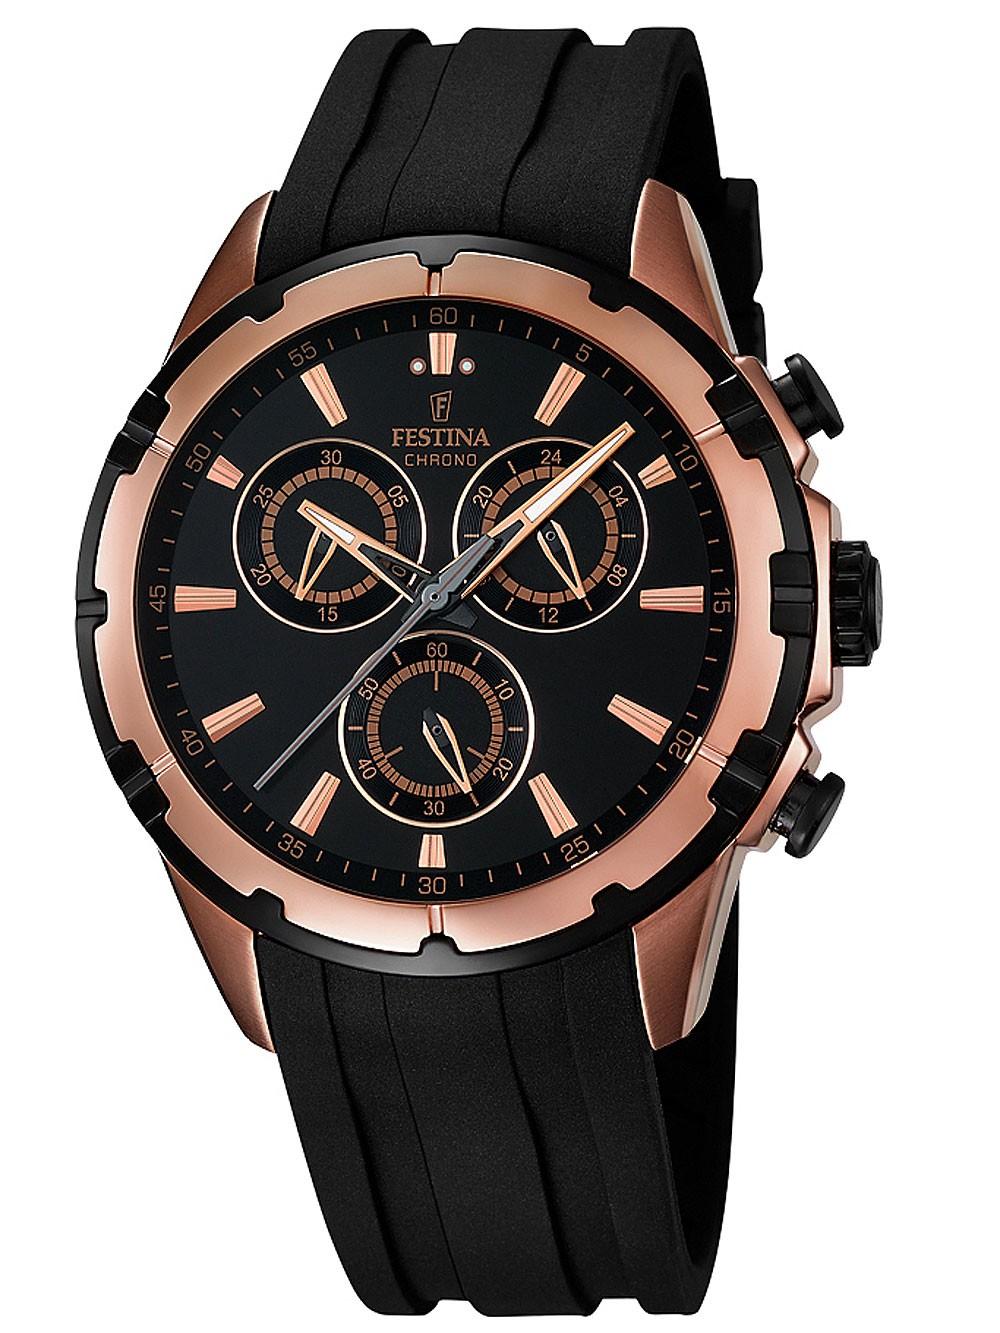 watches chrono12 festina f16840 1 chronograph 44mm 10atm. Black Bedroom Furniture Sets. Home Design Ideas